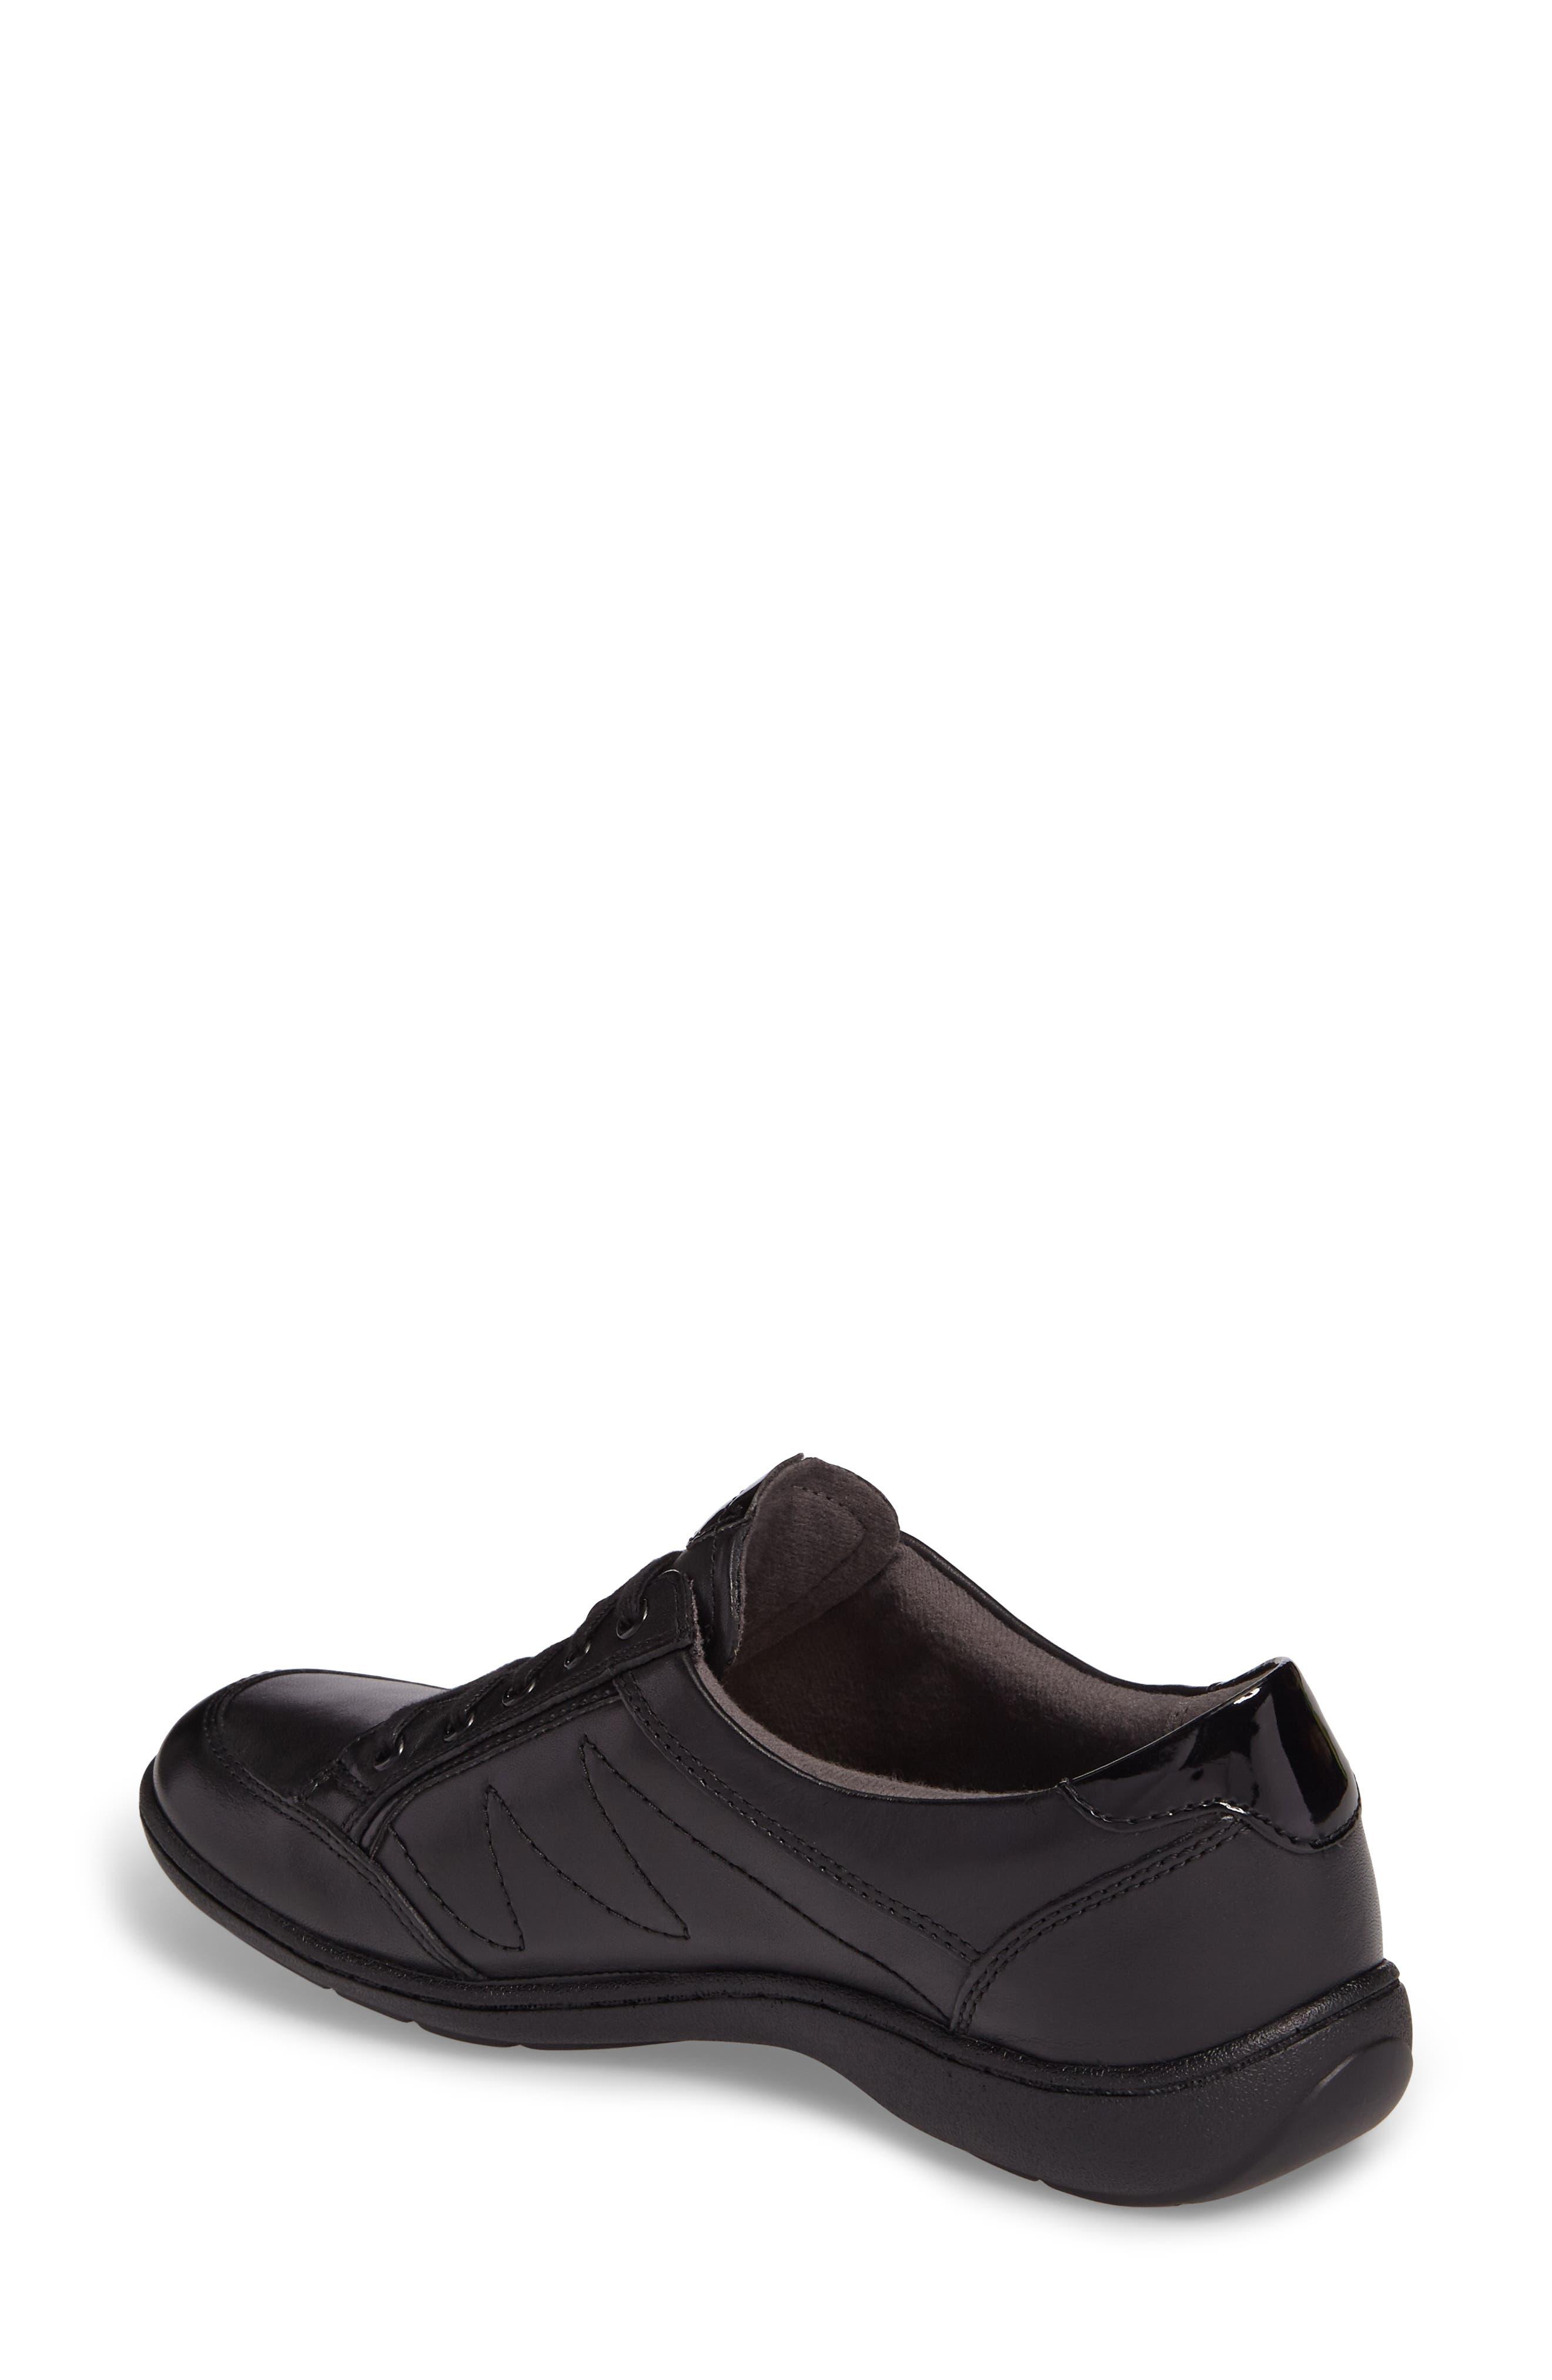 Bromly Sneaker,                             Alternate thumbnail 2, color,                             Black Leather